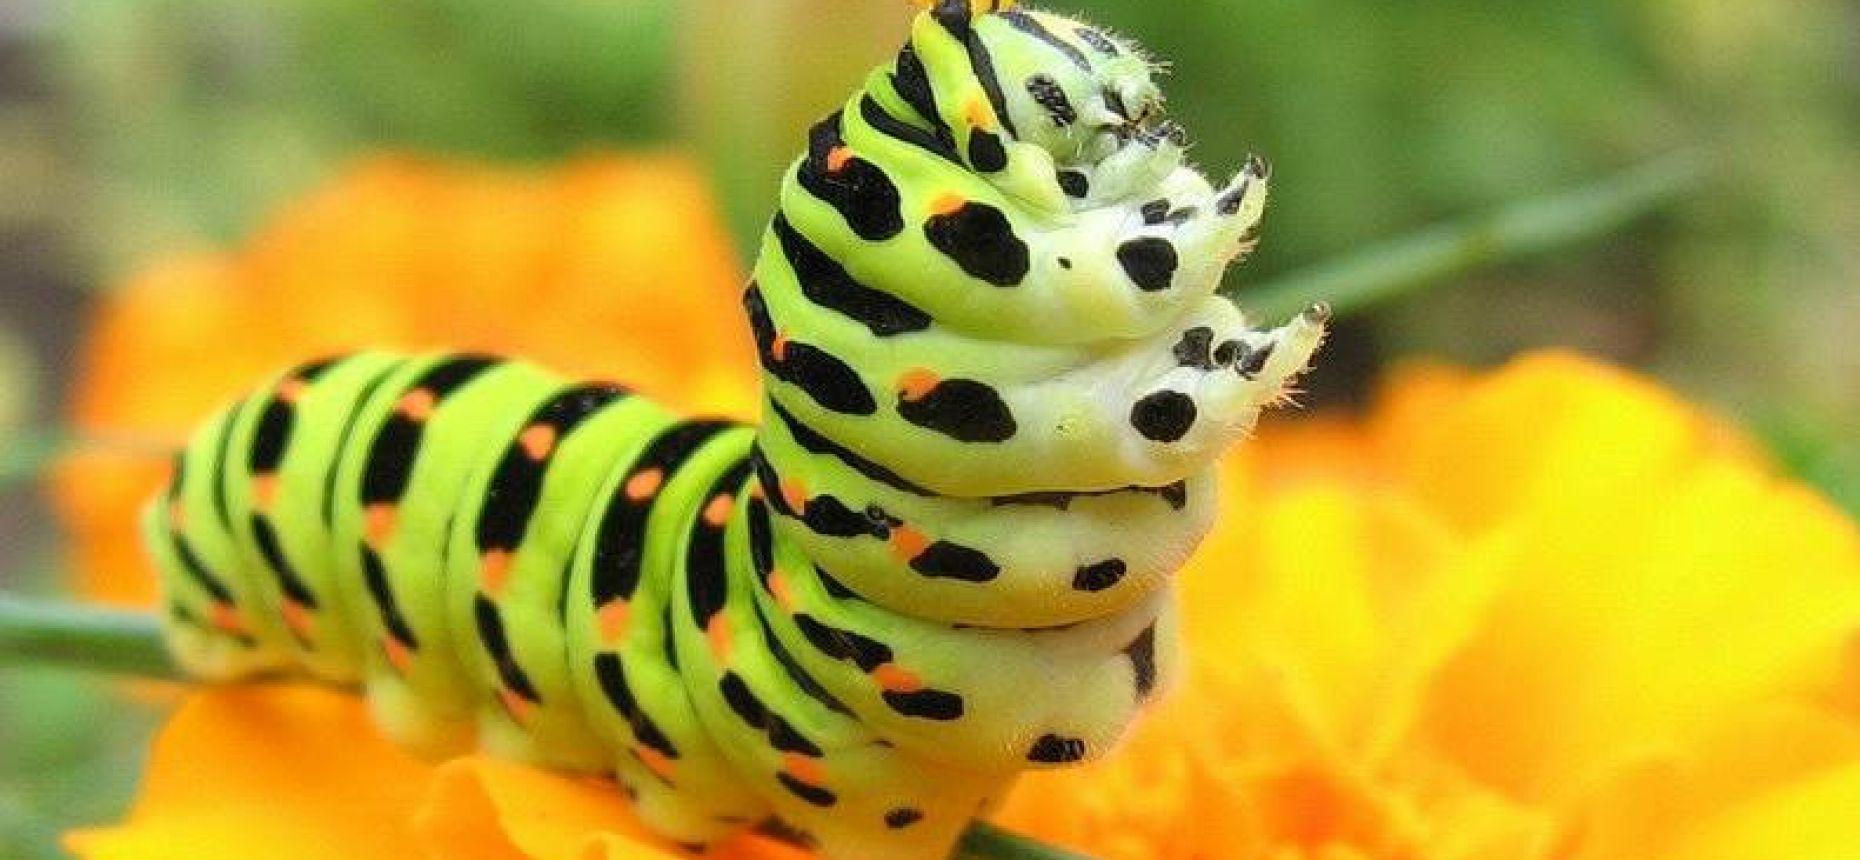 Мускулистые гусеницы